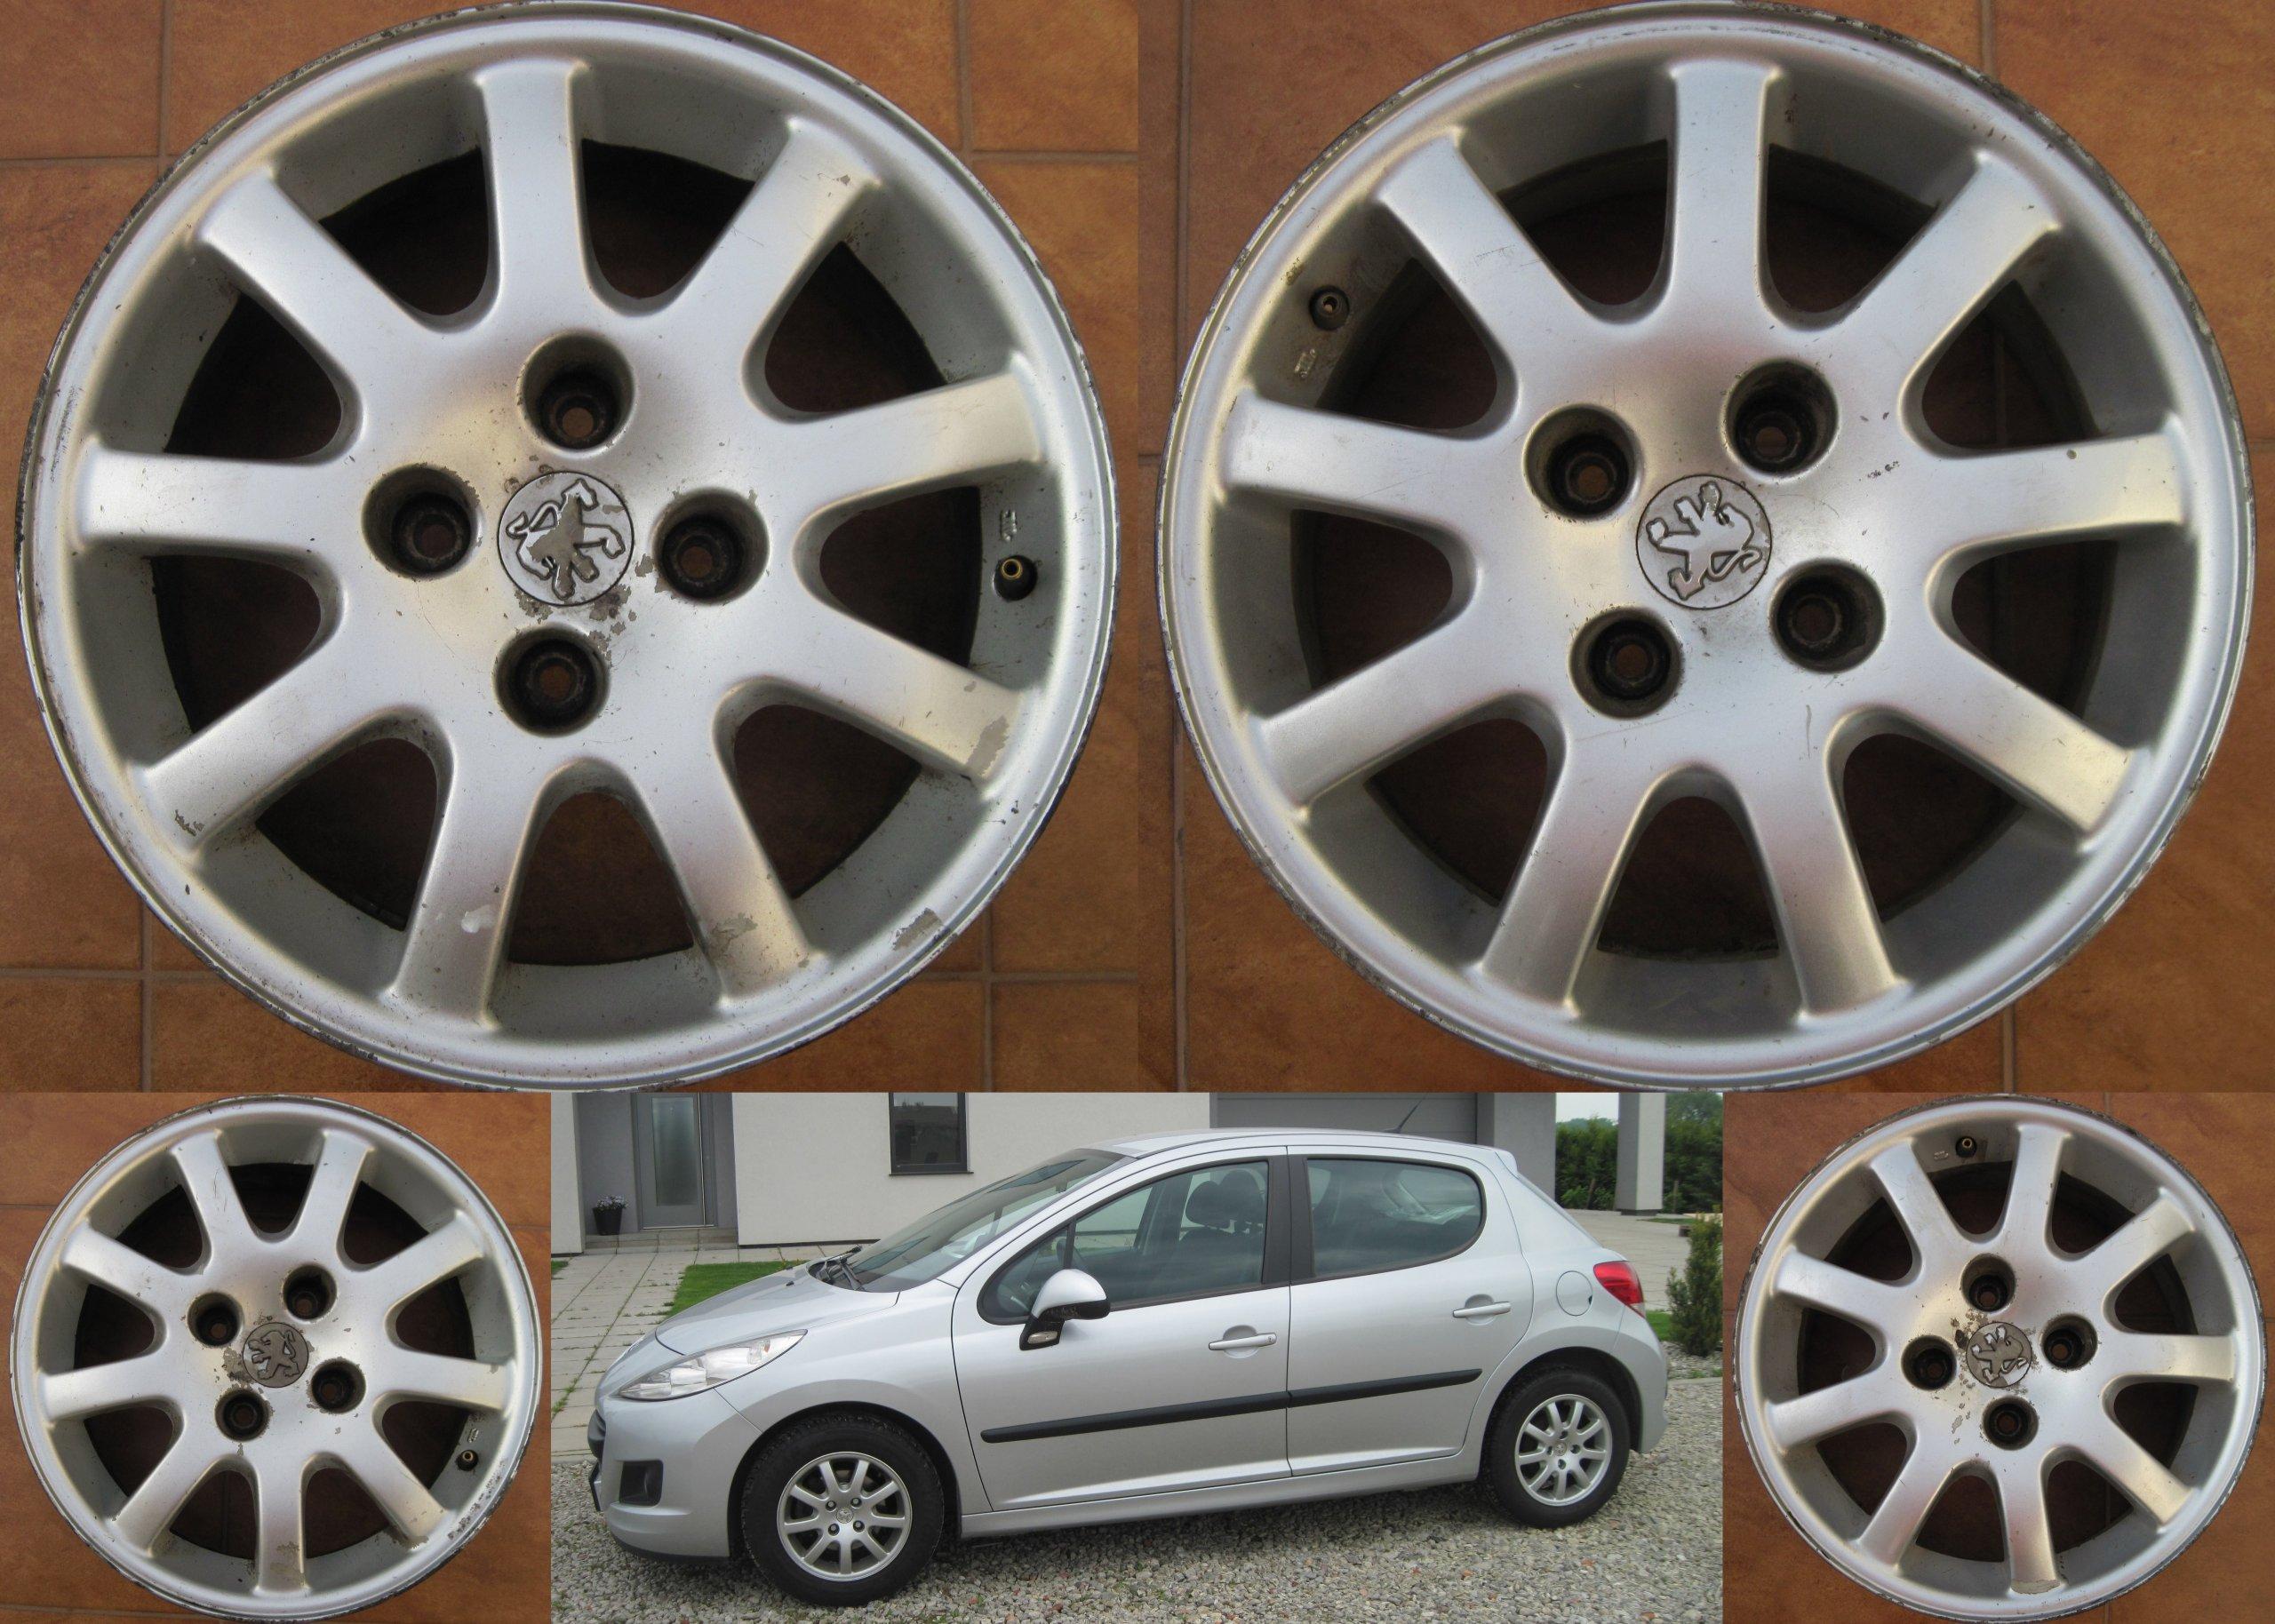 Felgi Aluminiowe Alufelgi Oryg Peugeot 206 207 307 7167882988